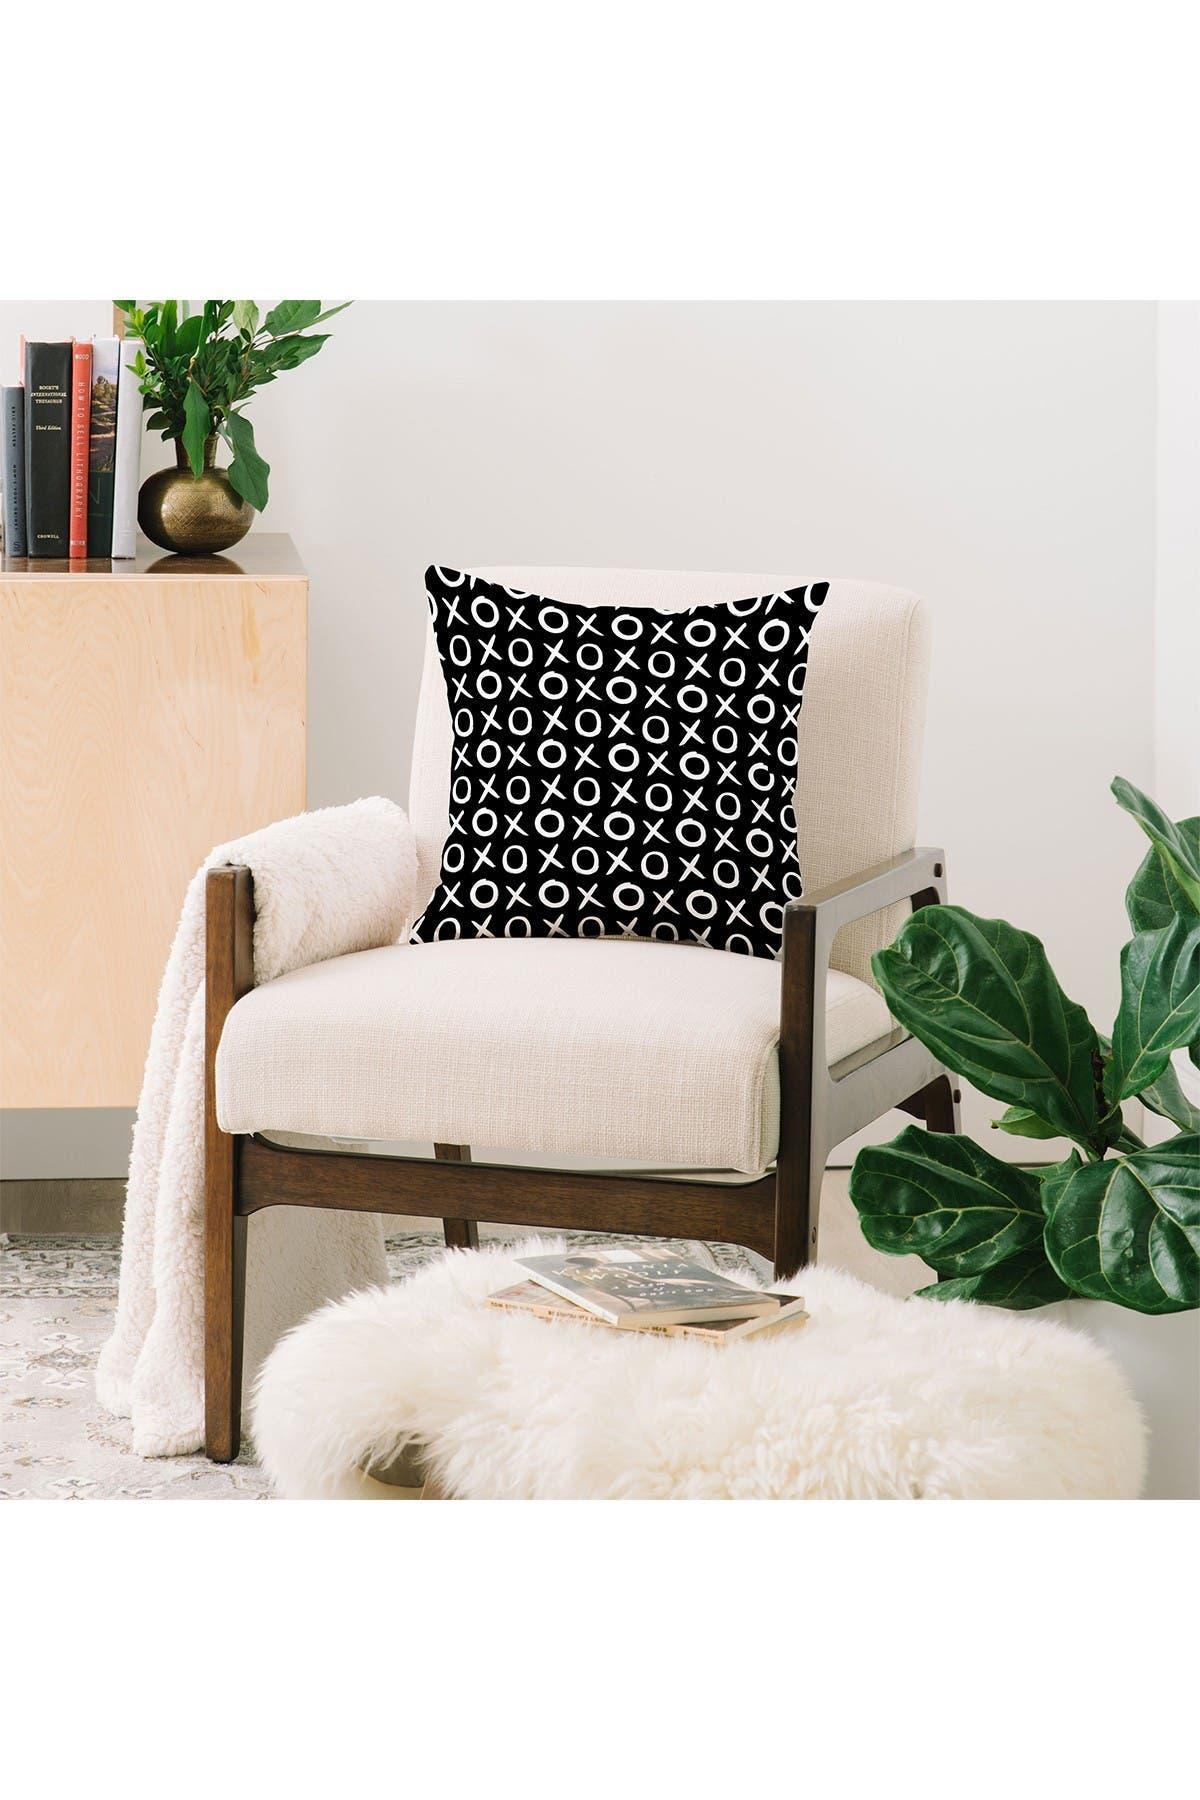 Image of Deny Designs Amy Sia Love XO White & Black Square Throw Pillow